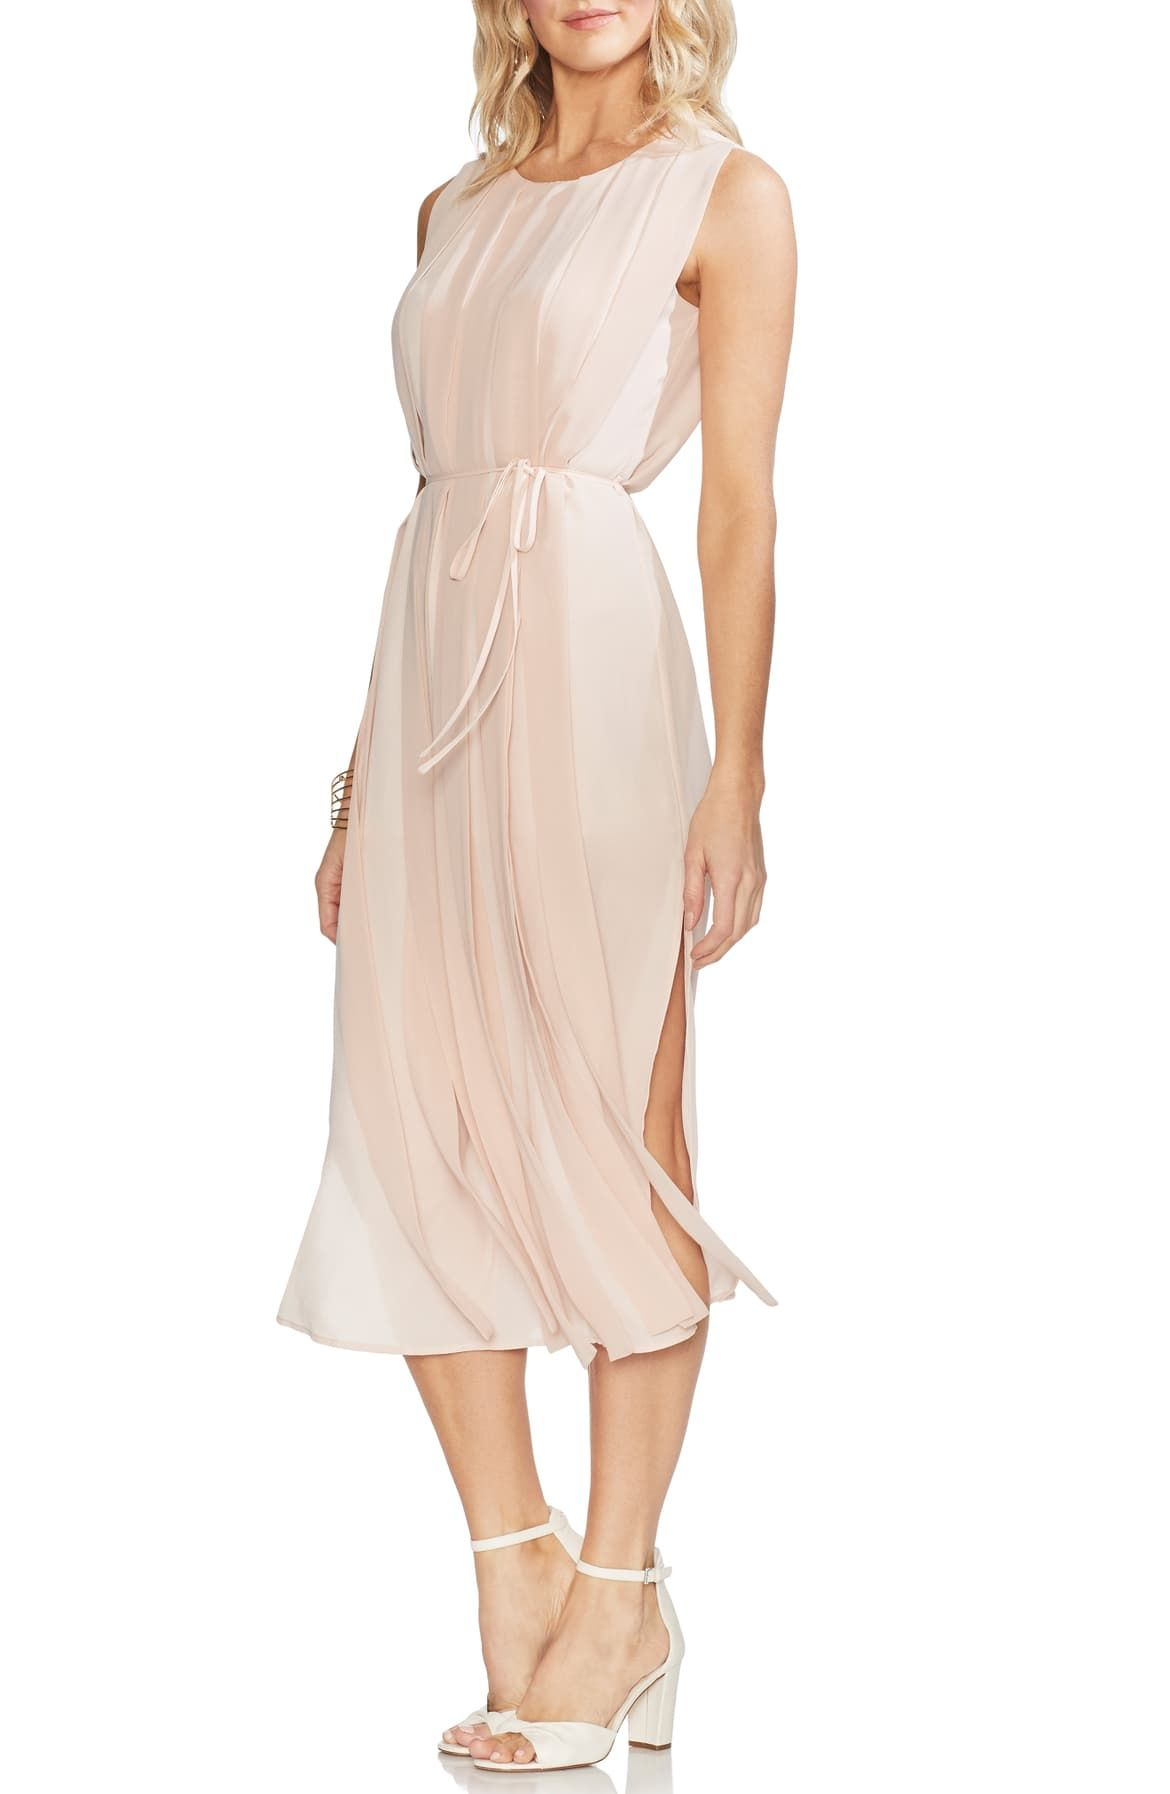 Vince Camuto Pleated Overlay Sleeveless Dress Nordstrom Dresses Overlay Dress Nordstrom Dresses [ 1794 x 1170 Pixel ]